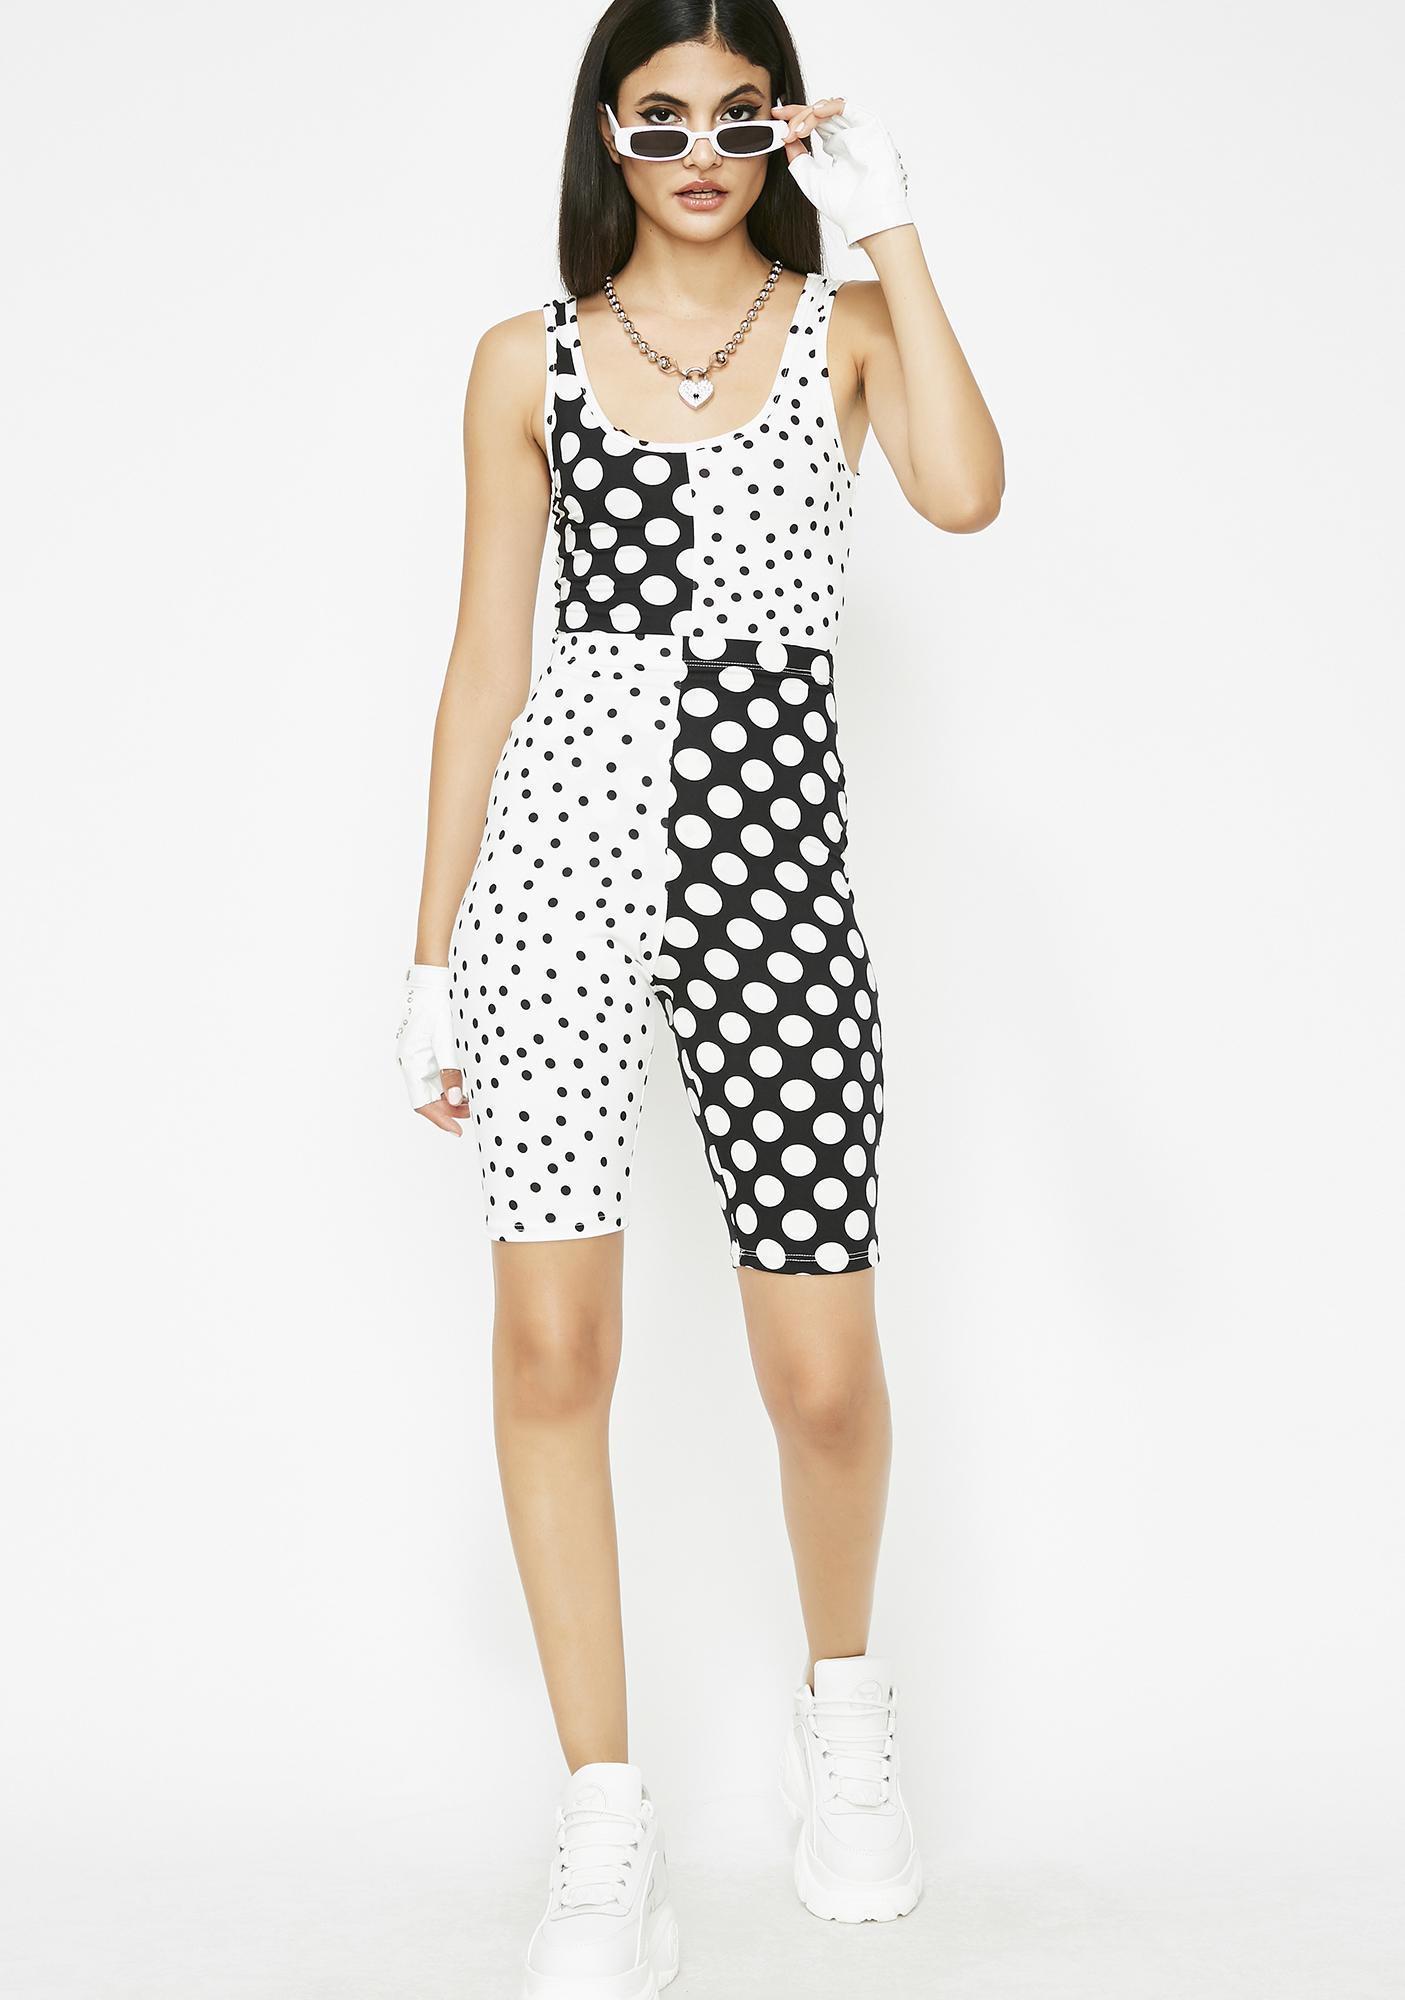 Hot Spot Polka Dot Bodysuit